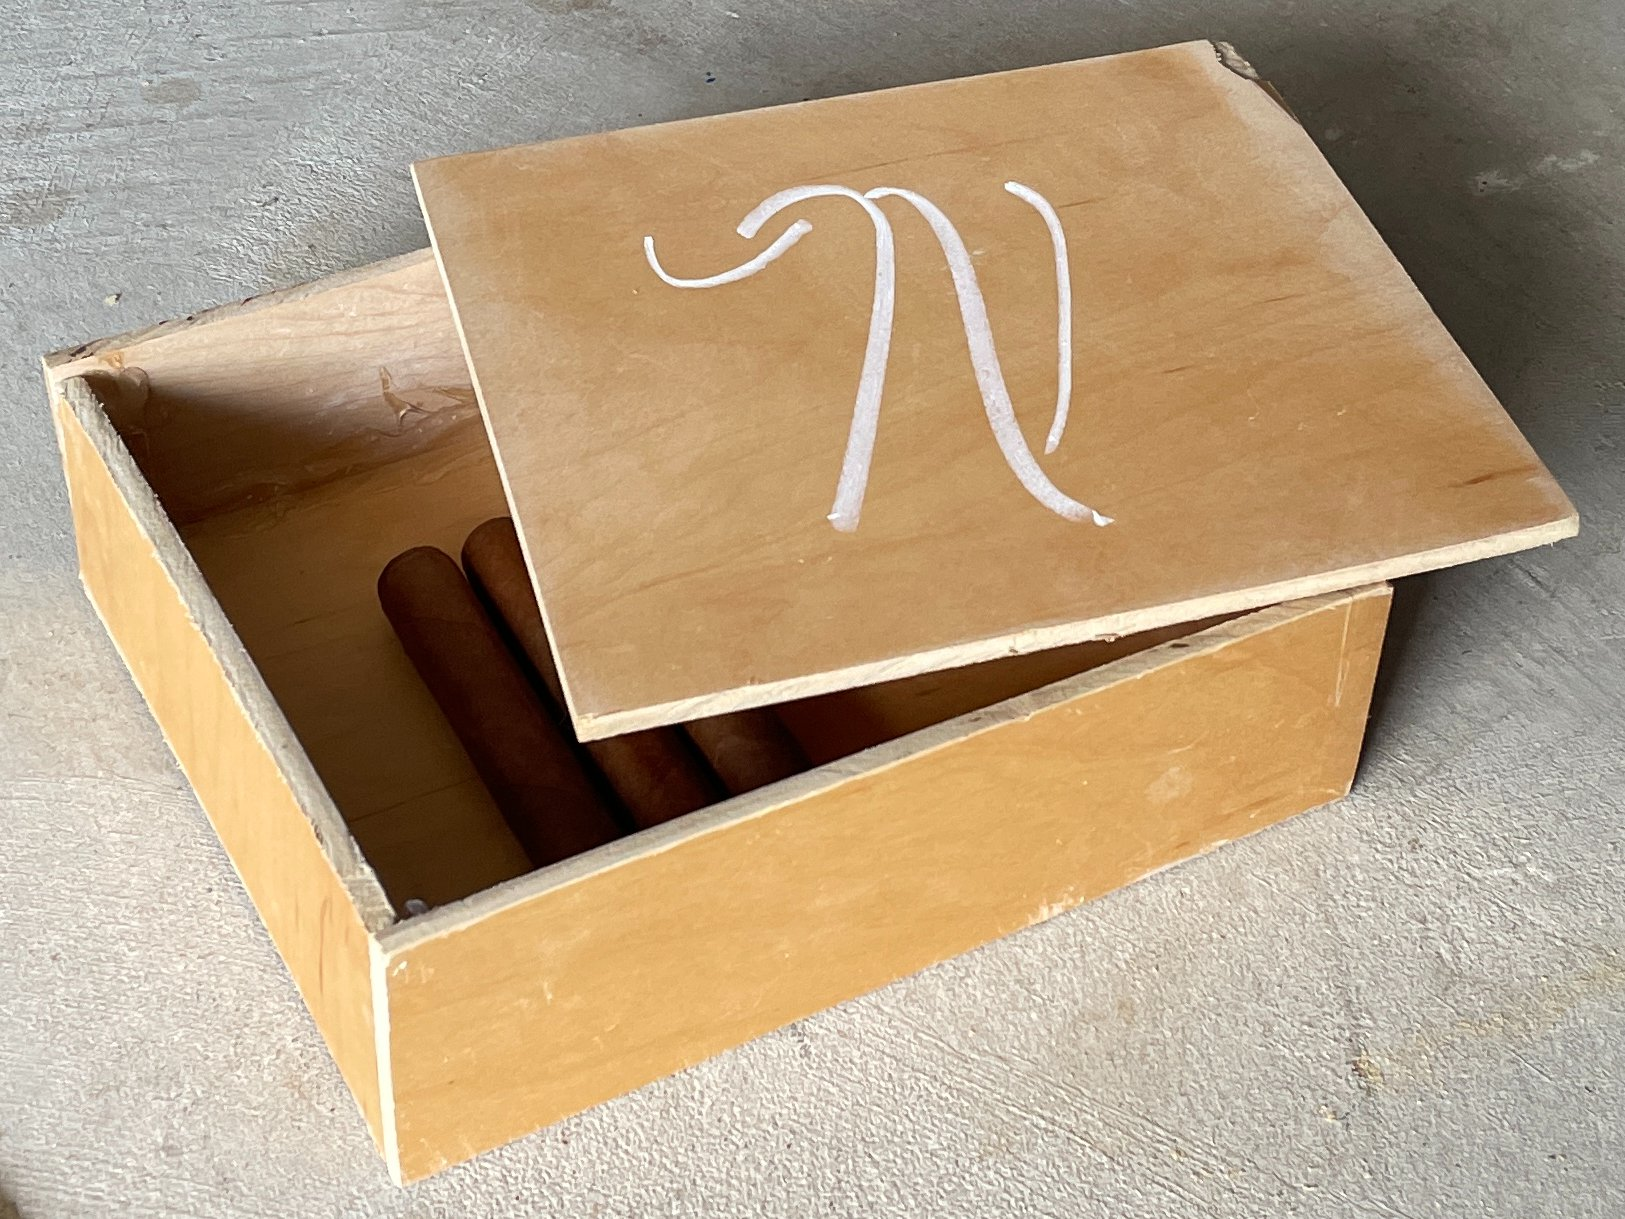 cigar box project 2